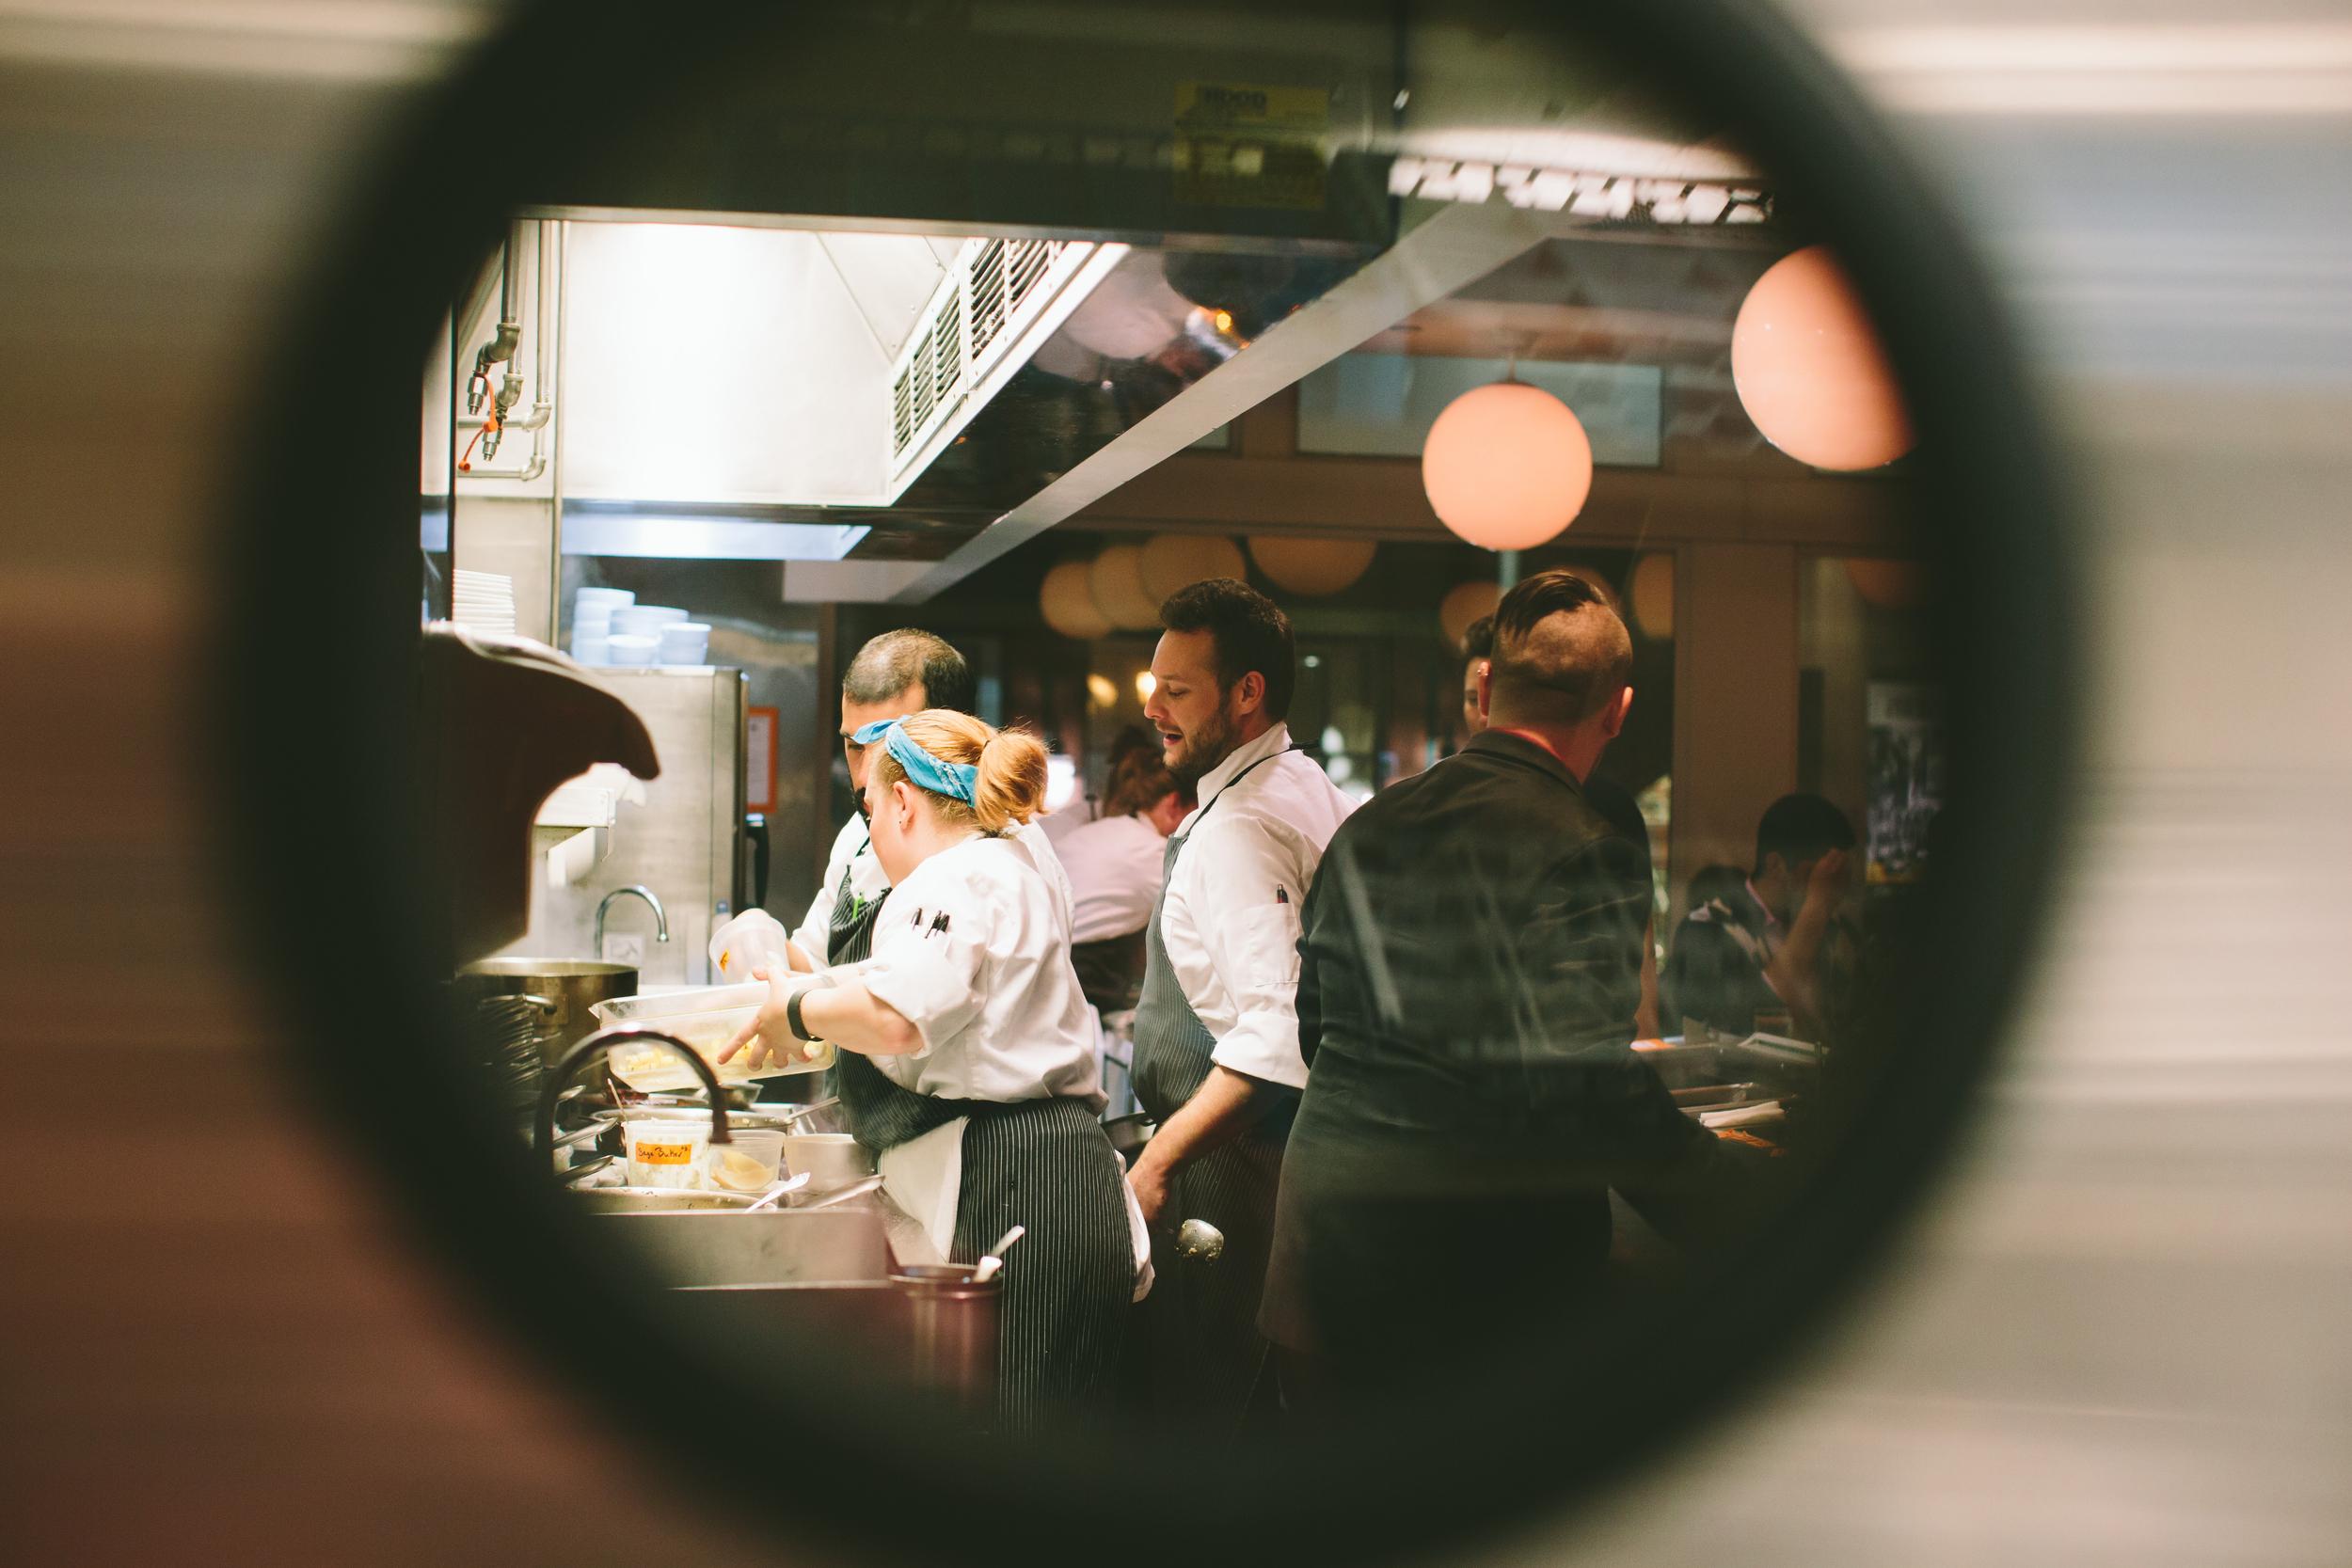 SPORTELLO SIENA FARMS DINNER_BRIAN SAMUELS PHOTOGRAPHY_SEPTEMBER 2015 - 45